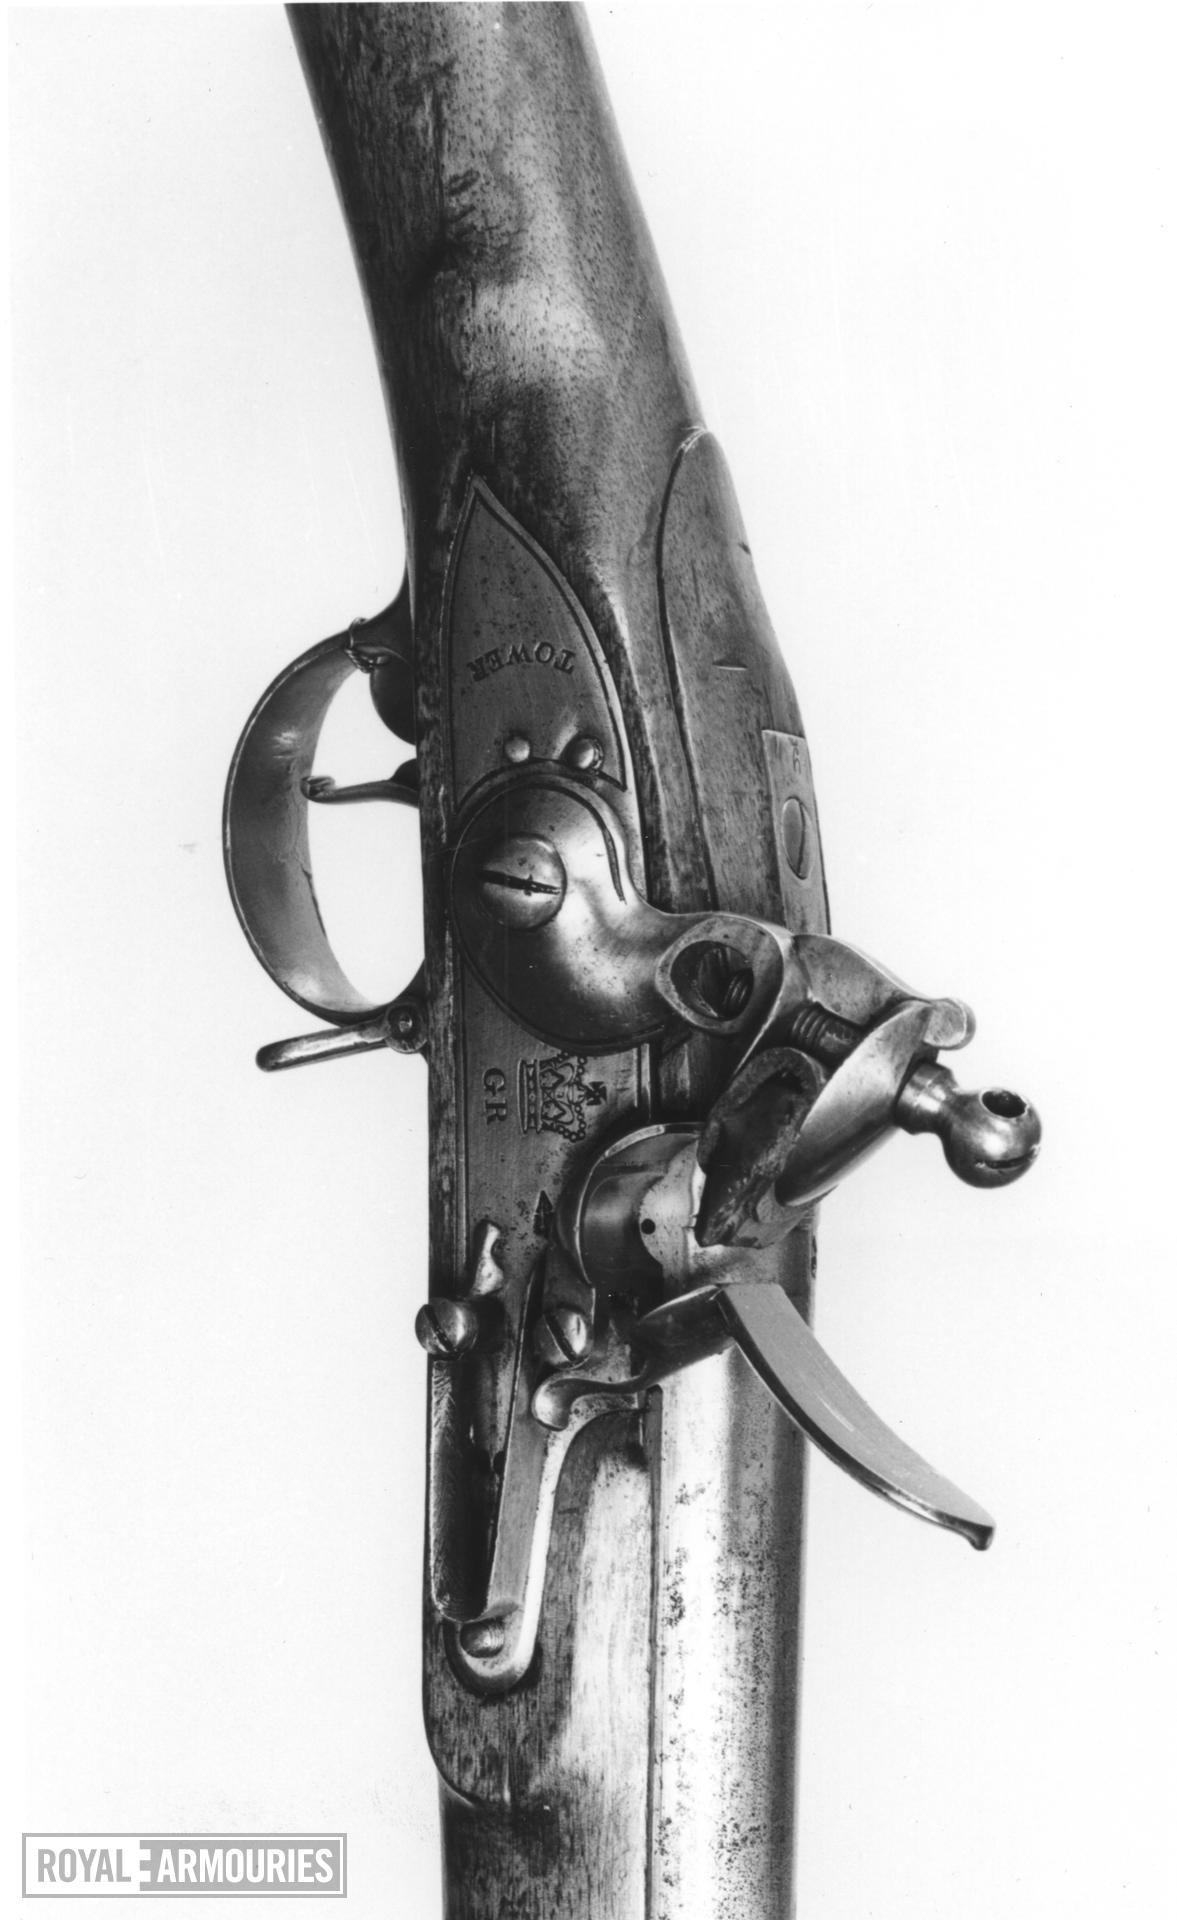 Flintlock muzzle-loading military musket - India Pattern